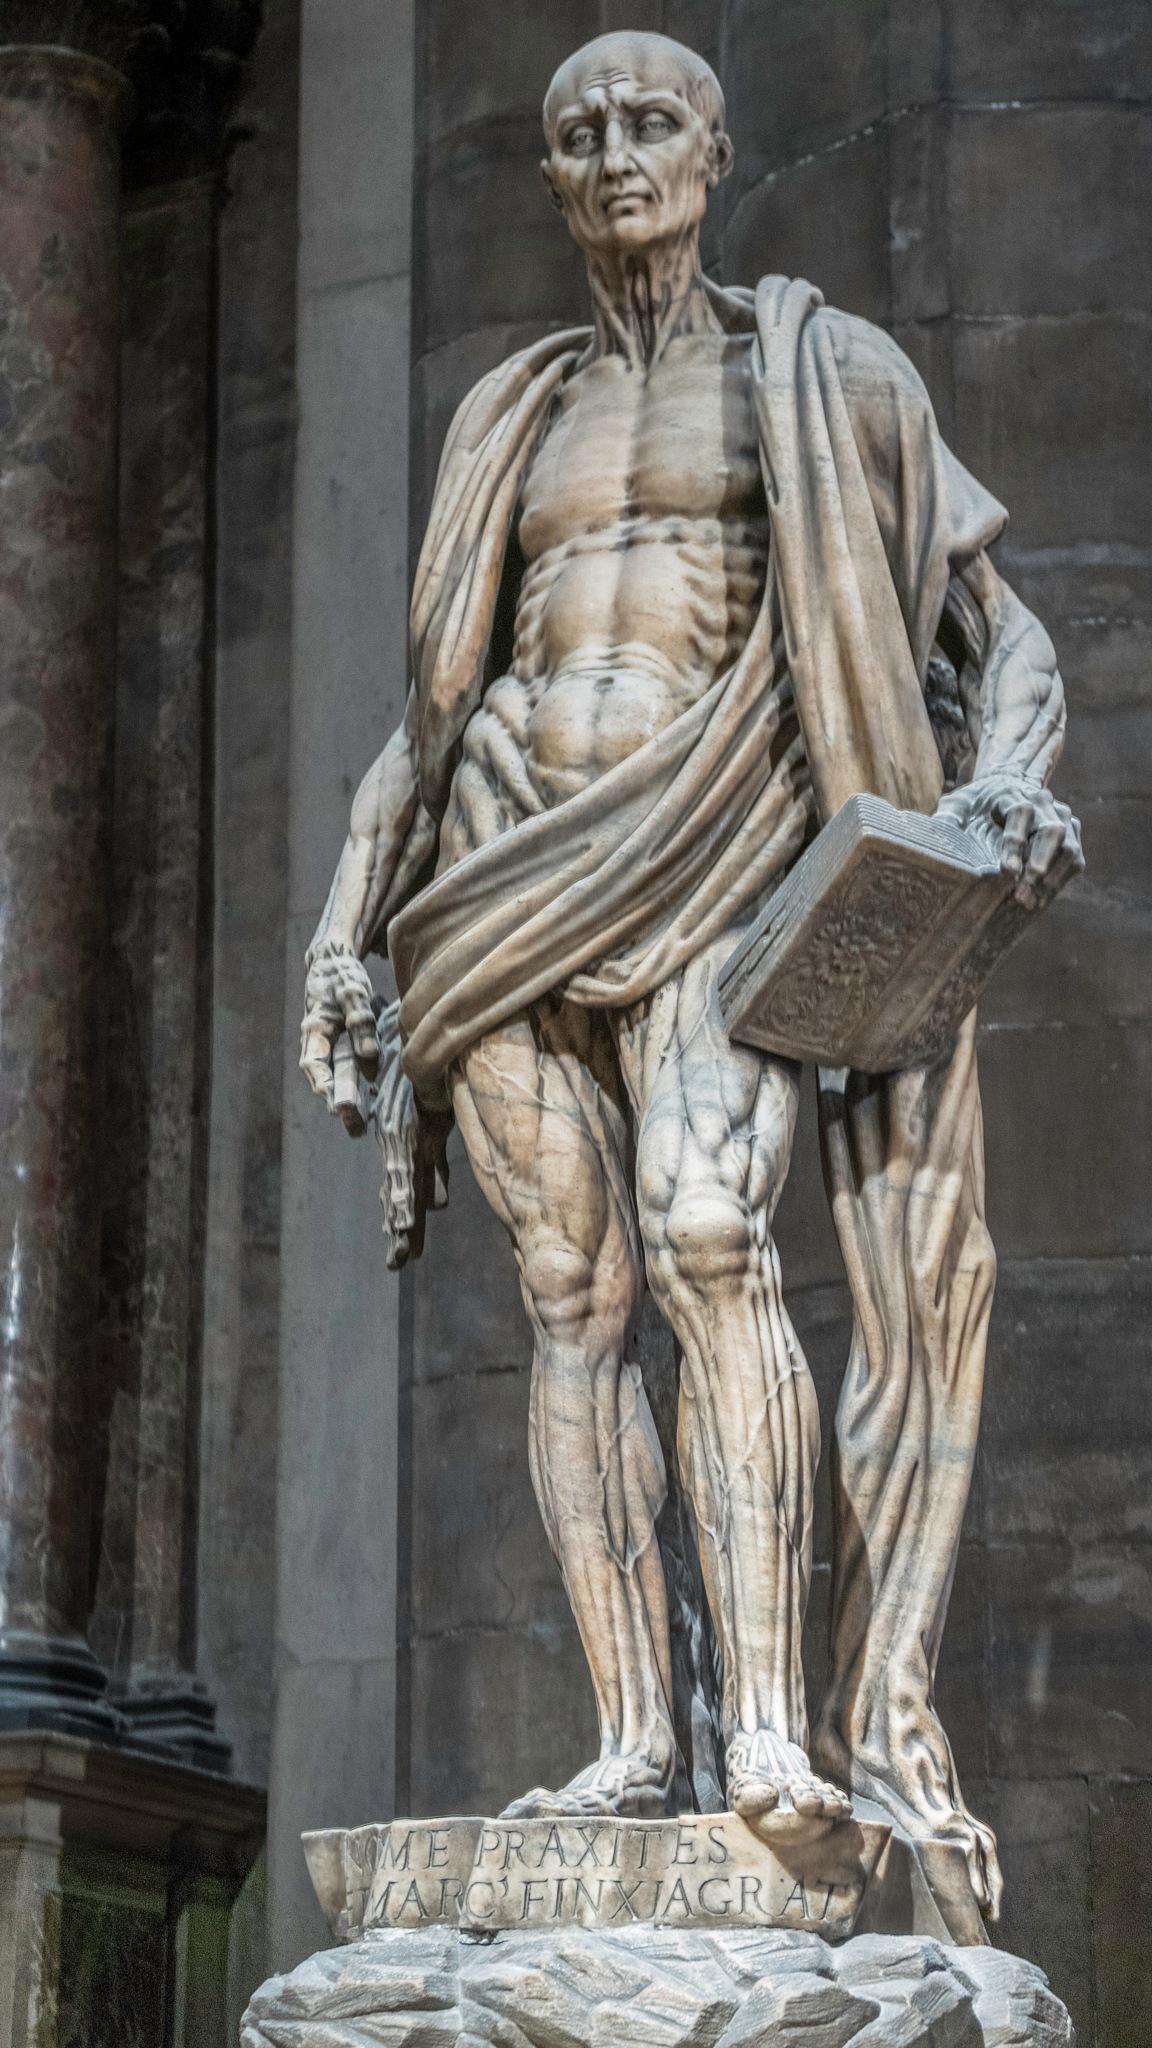 Sculpture of St. Bartholomew by Jose Manuel Navarro